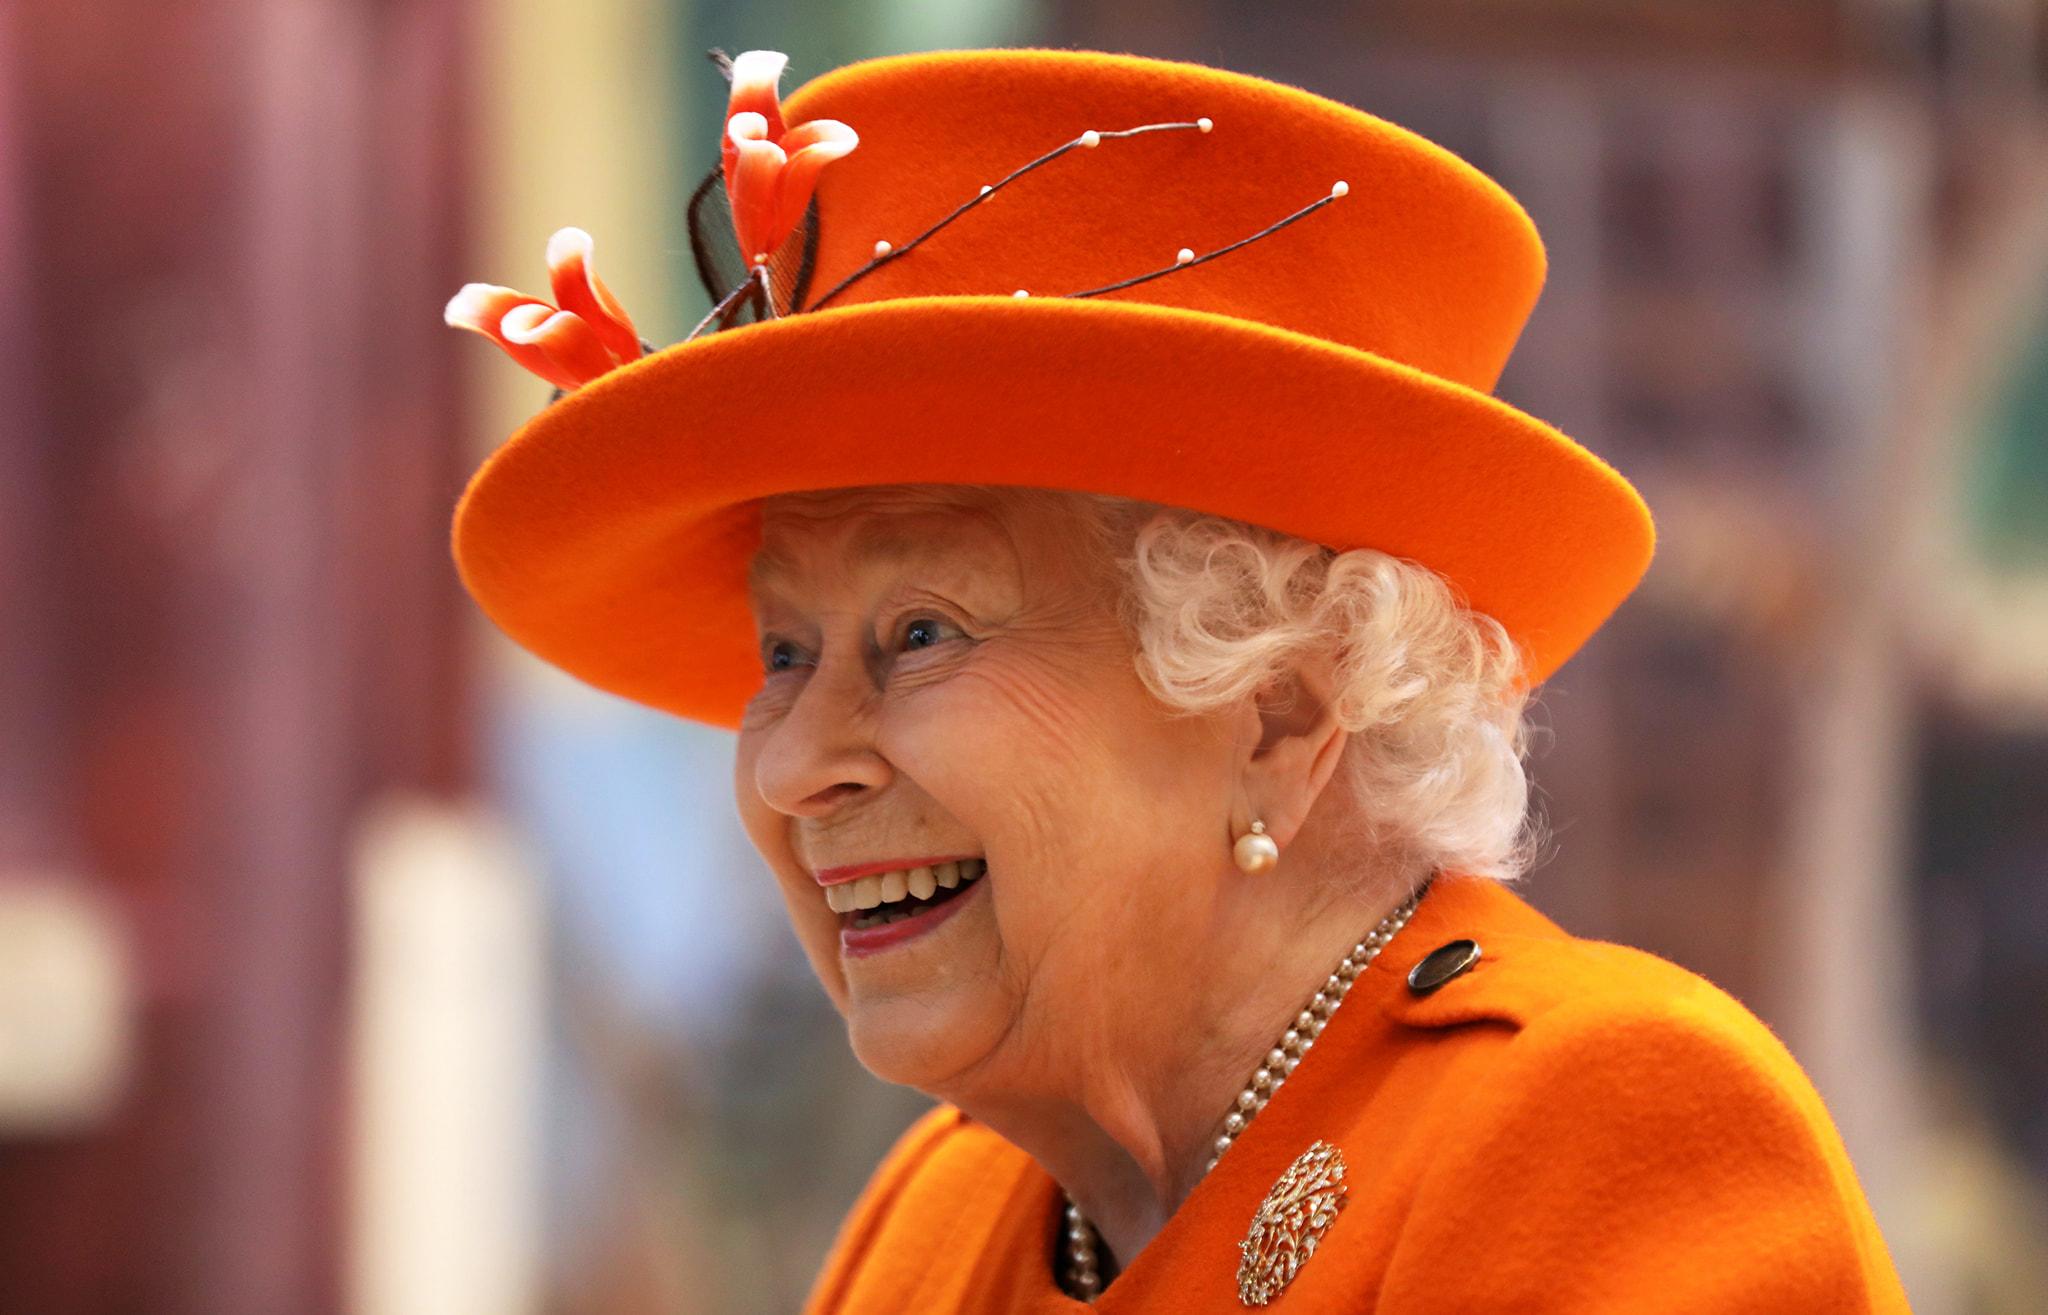 Королева Елизавета II продемонстрировала поддержку Меган Маркл и принца Гарри